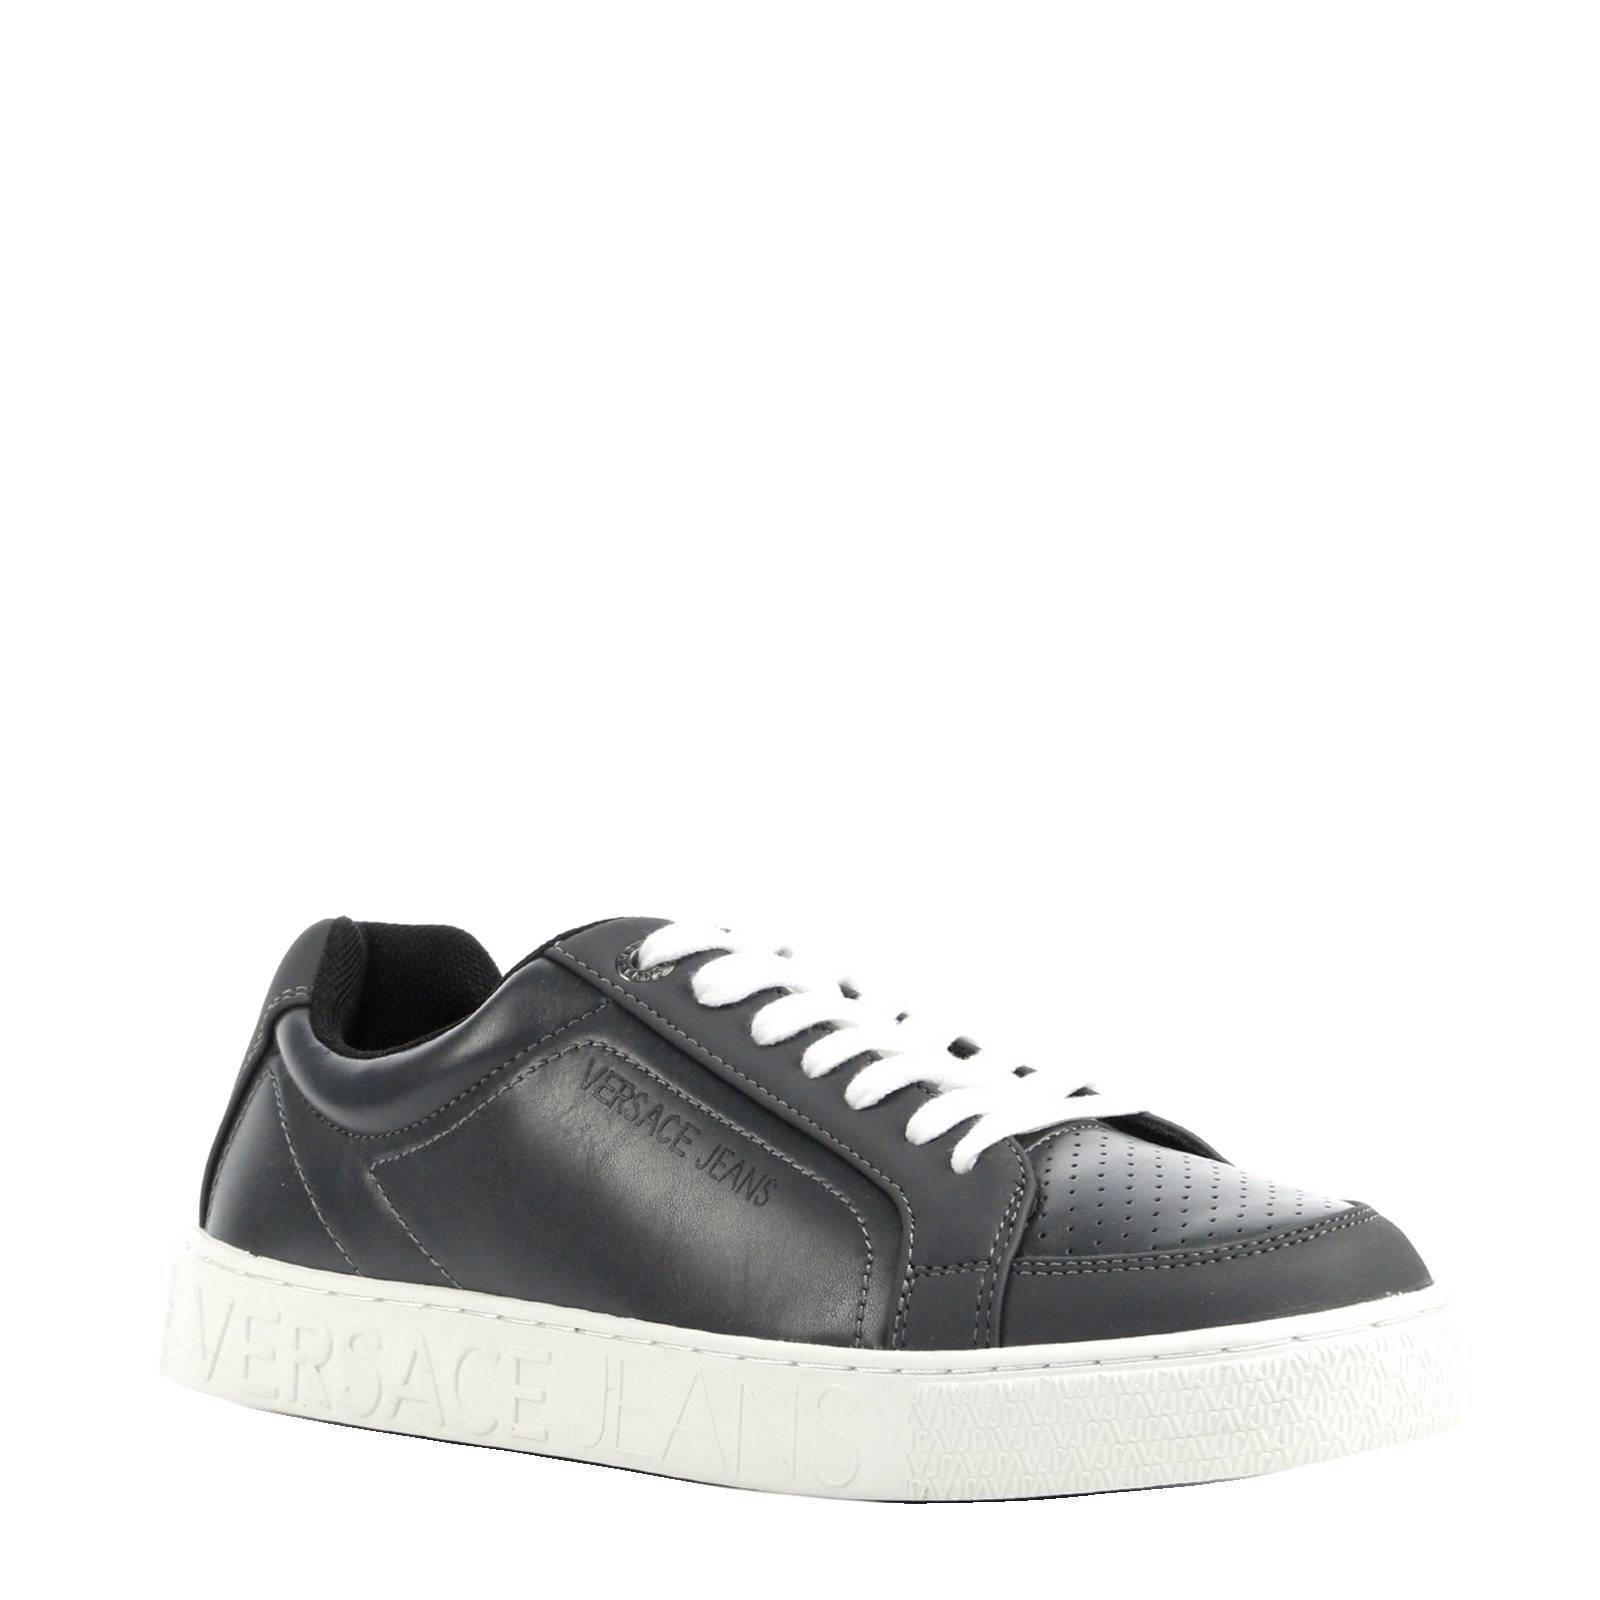 Versace Jeans Yobse I sneakers | wehkamp